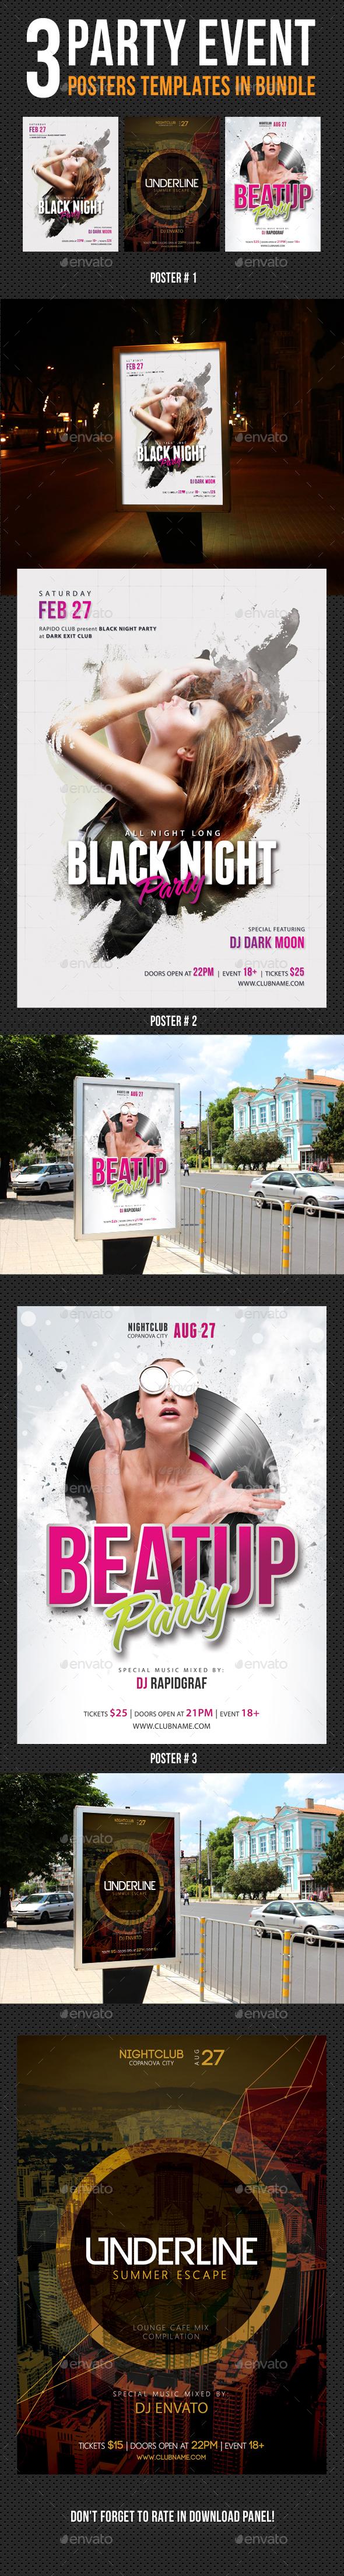 3 Party Event Music Poster Bundle 03 - Signage Print Templates